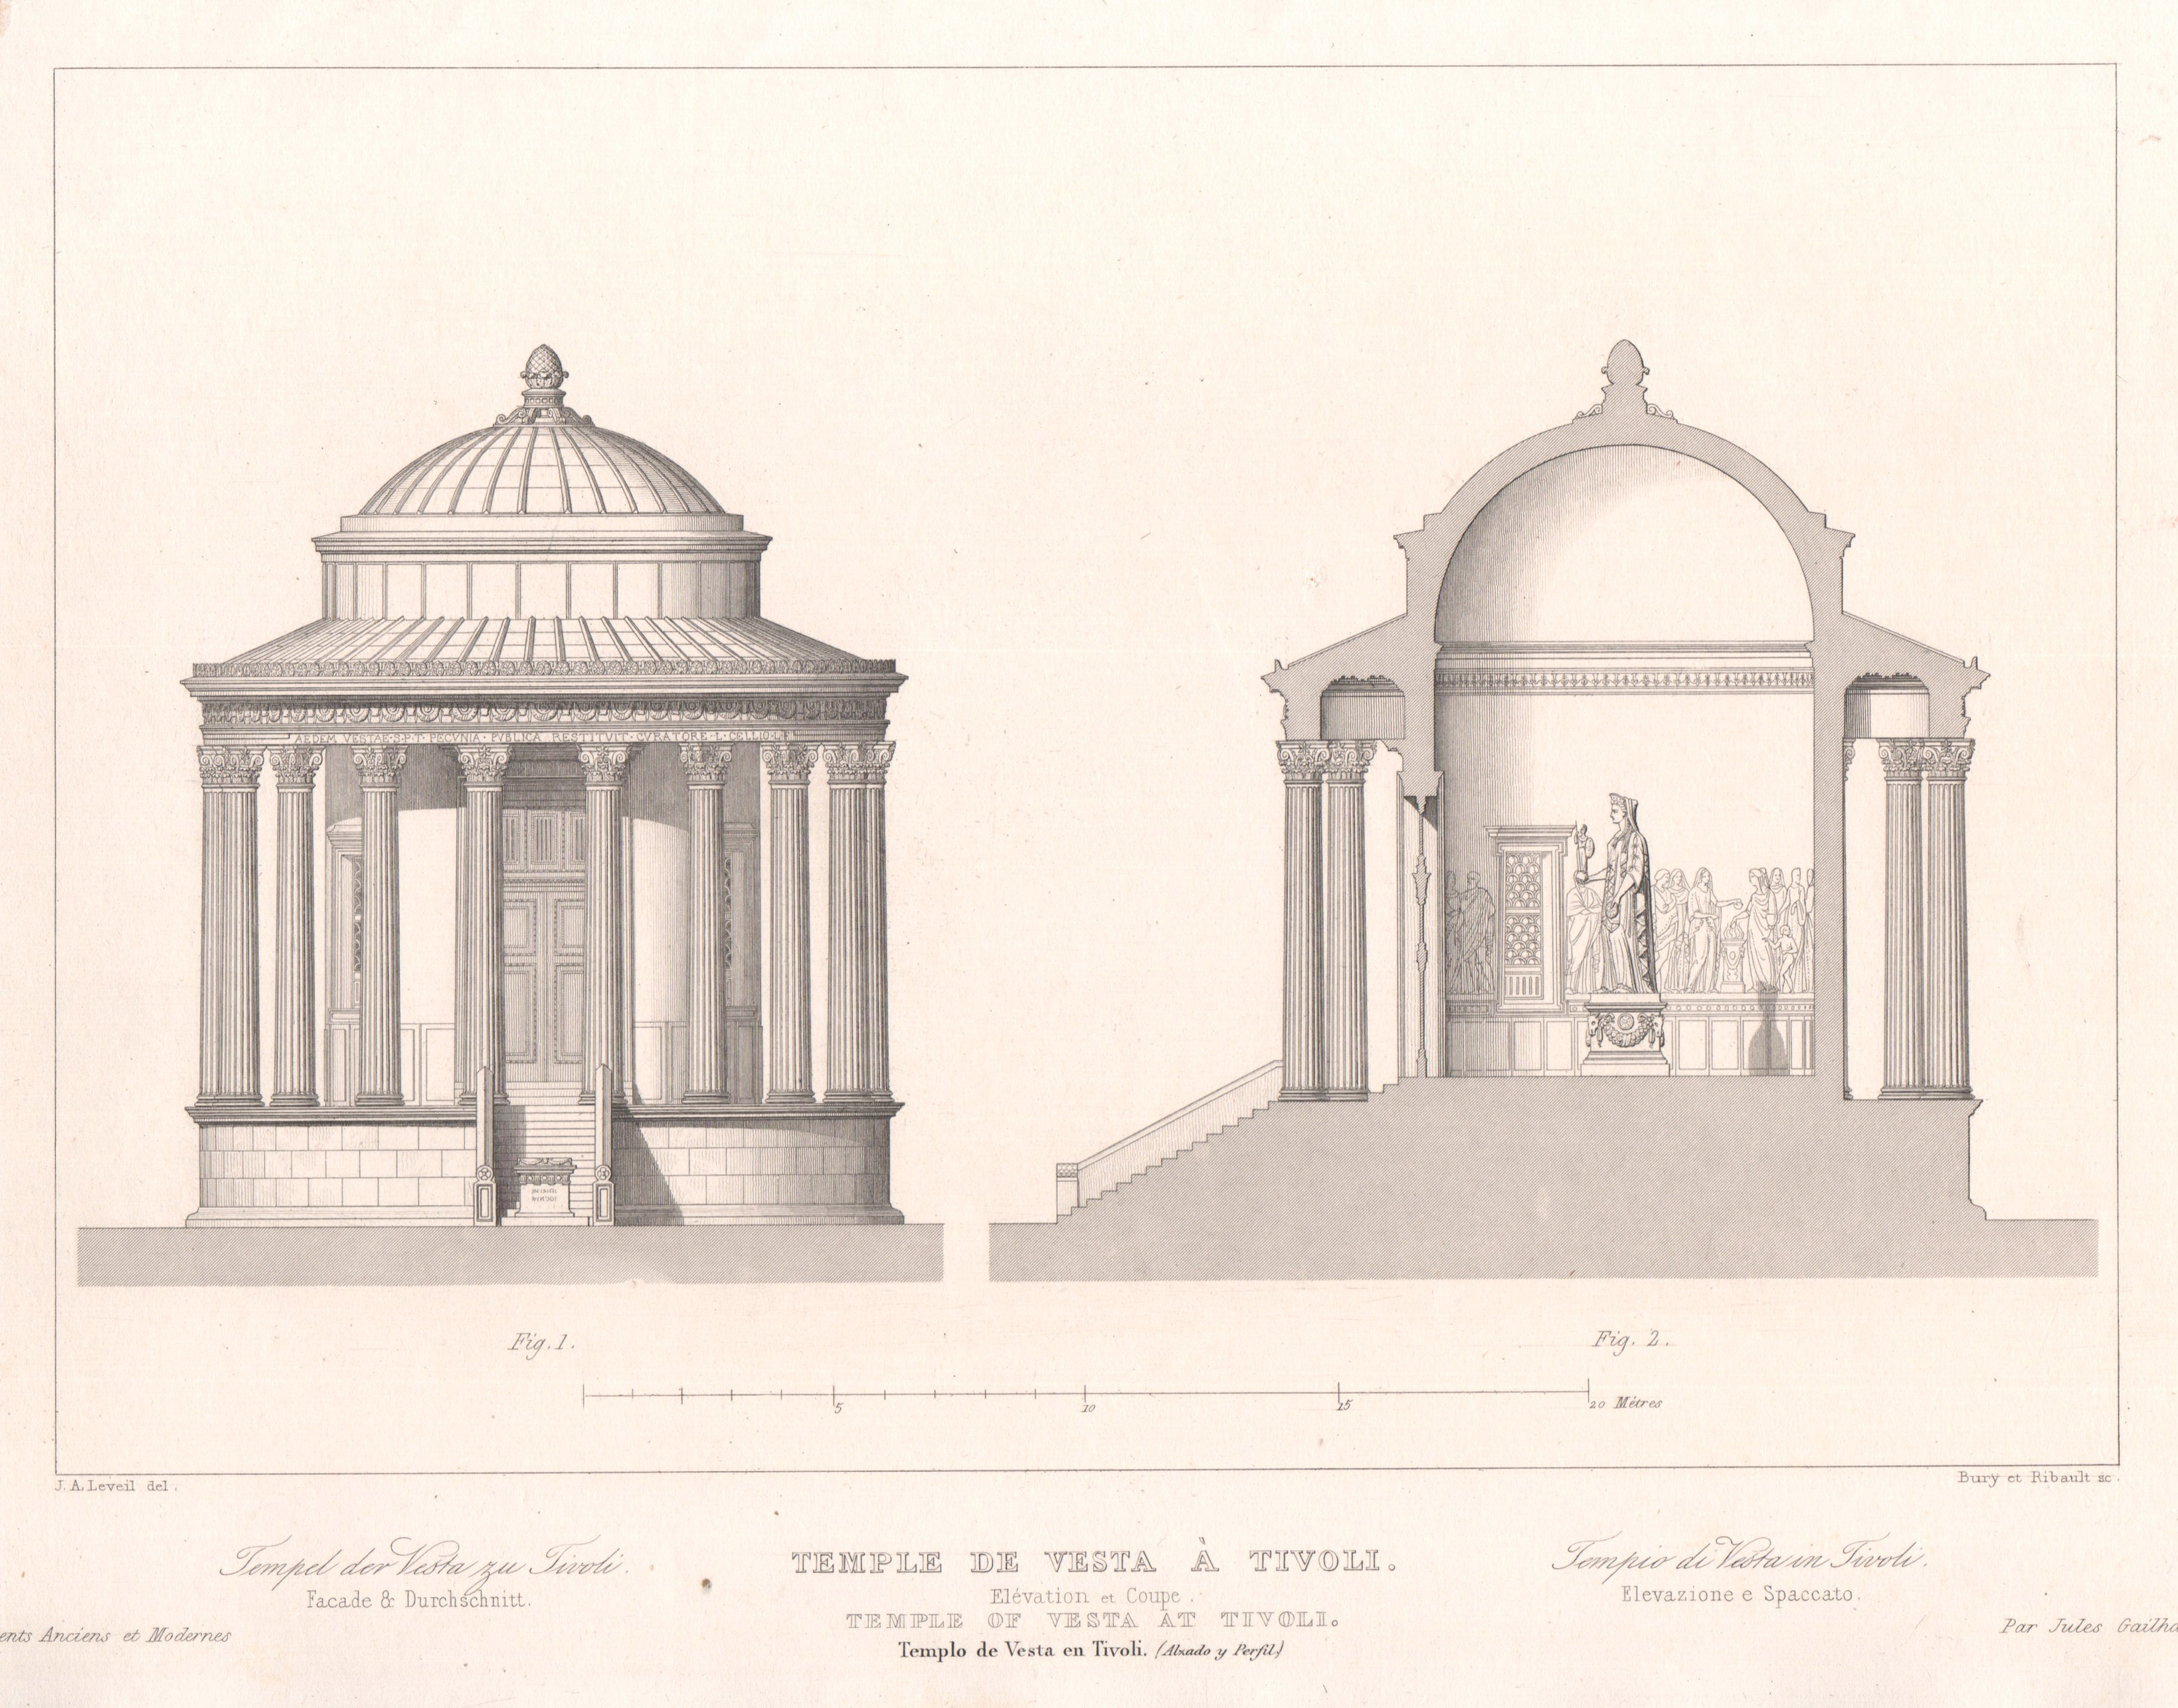 Italy - Antique Monuments - Tivoli - Temple of Vesta - Ancient Rome